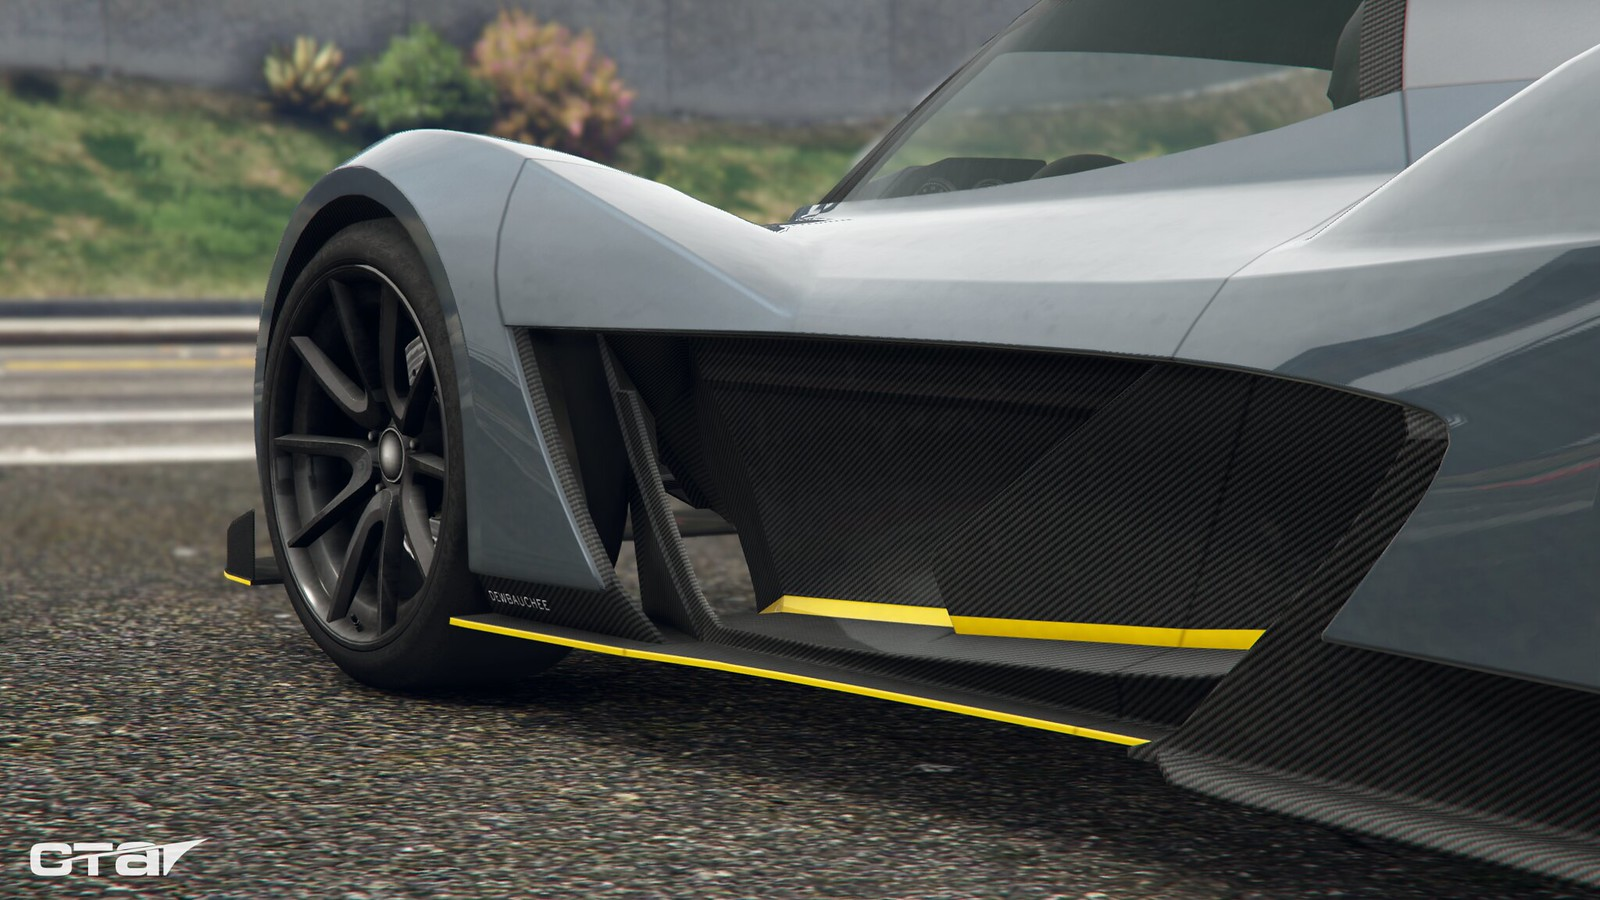 Dewbauchee Vagner Appreciation Thread - Vehicles - GTAForums